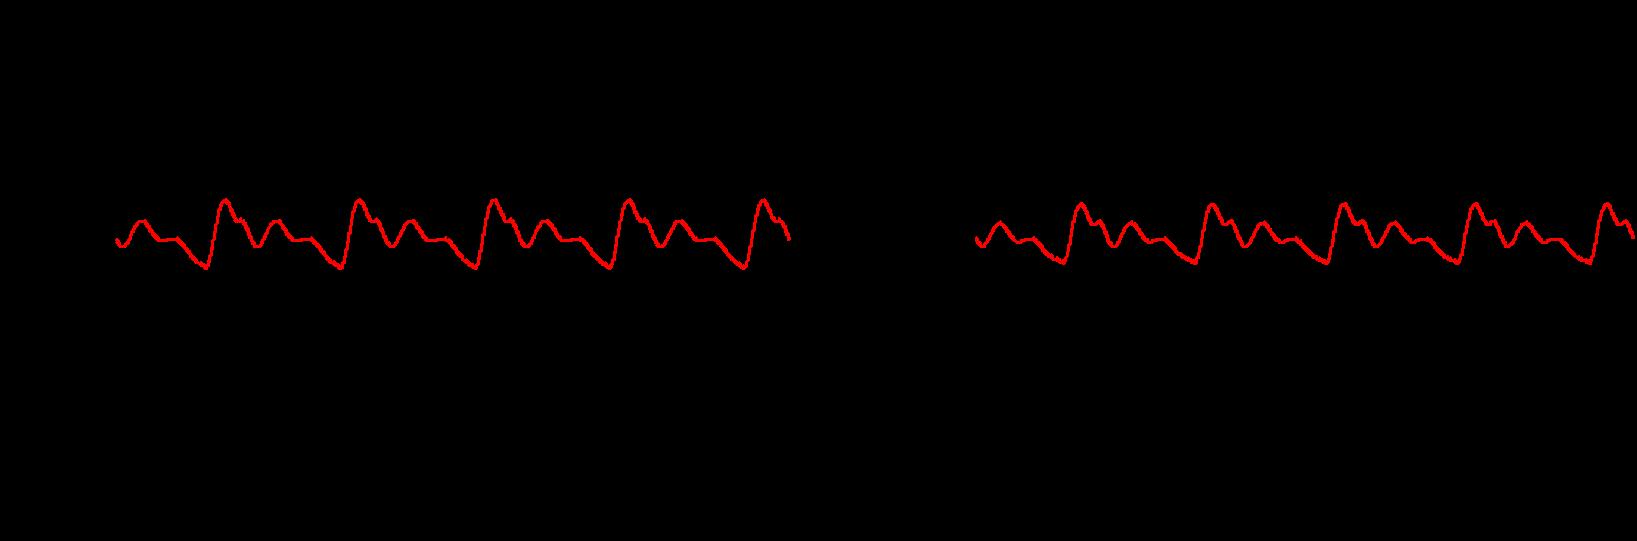 Figure 4: Output Voltage Ripple of MPM3833C